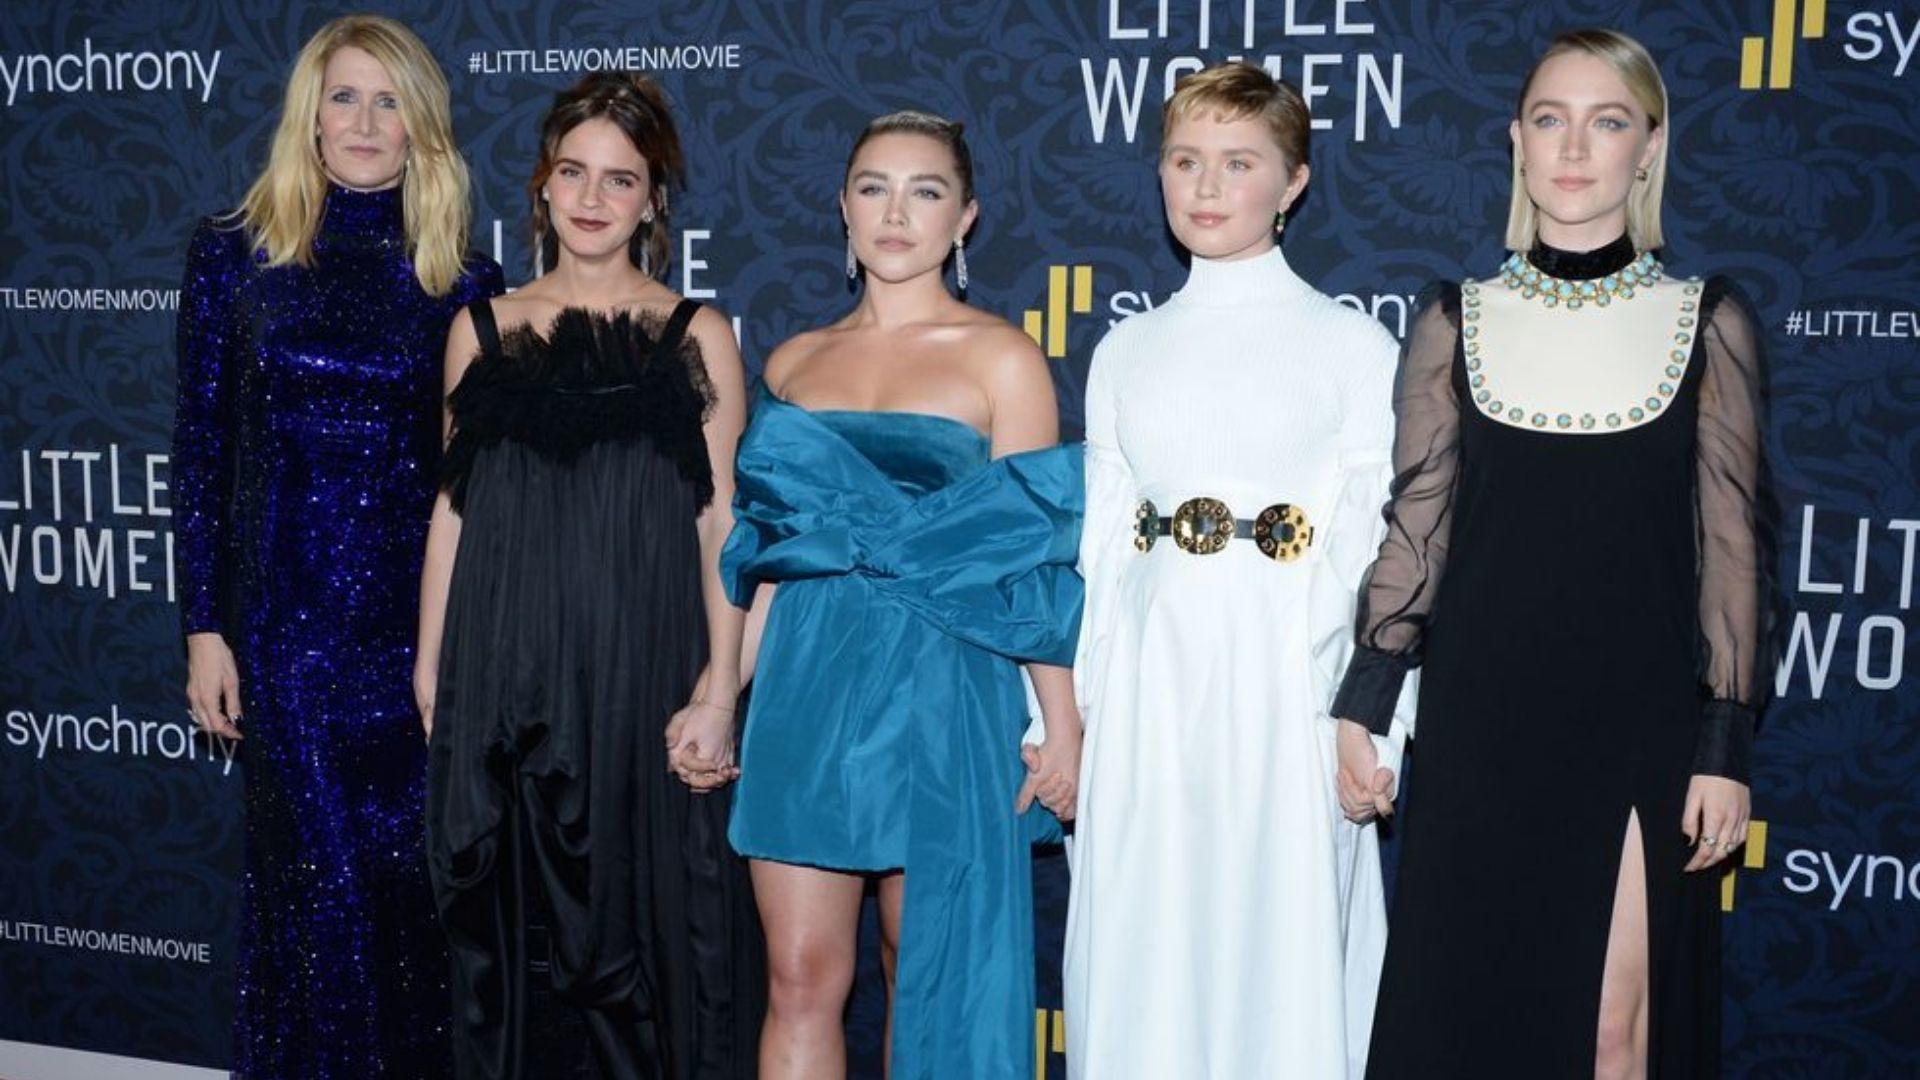 Timothée Chalamet Photobombed Greta Gerwig At The Little Women Premiere